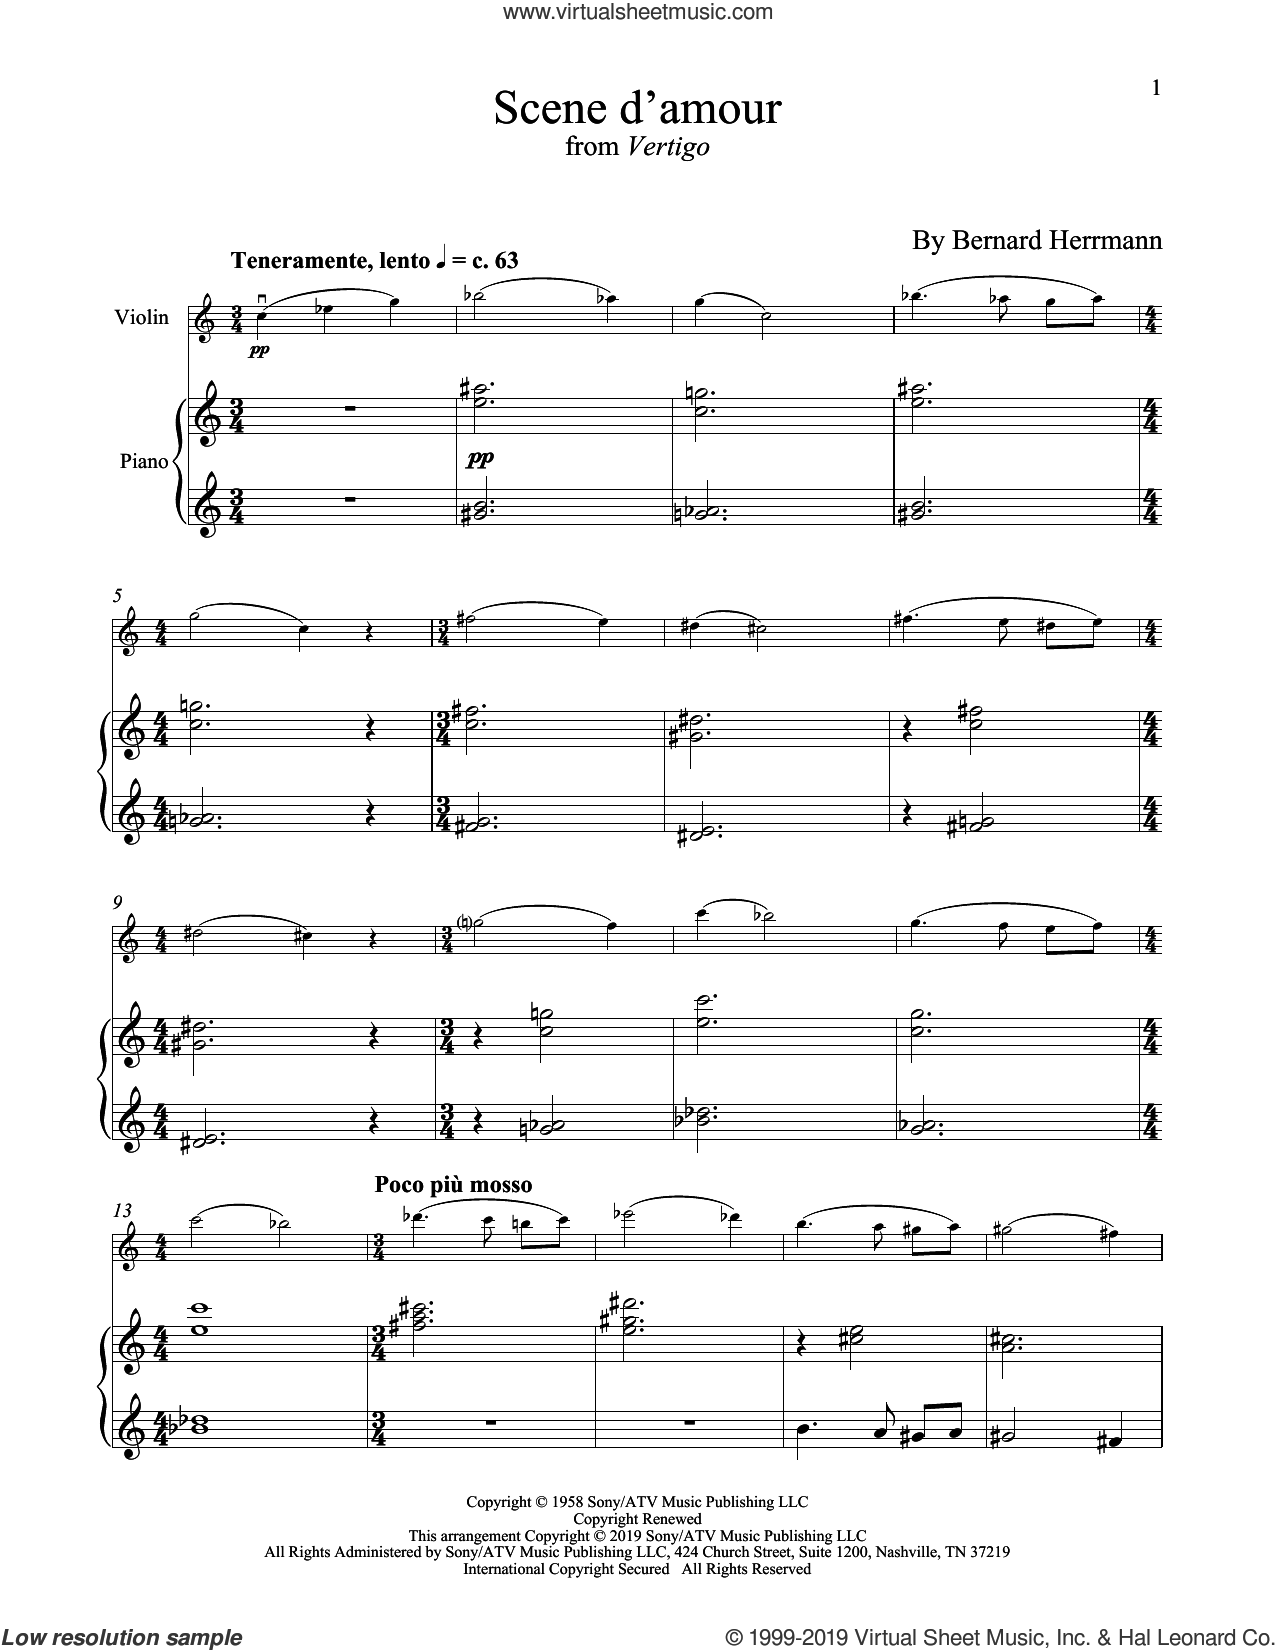 Scene D'Amour (from Vertigo) sheet music for violin and piano by Bernard Hermann, intermediate skill level